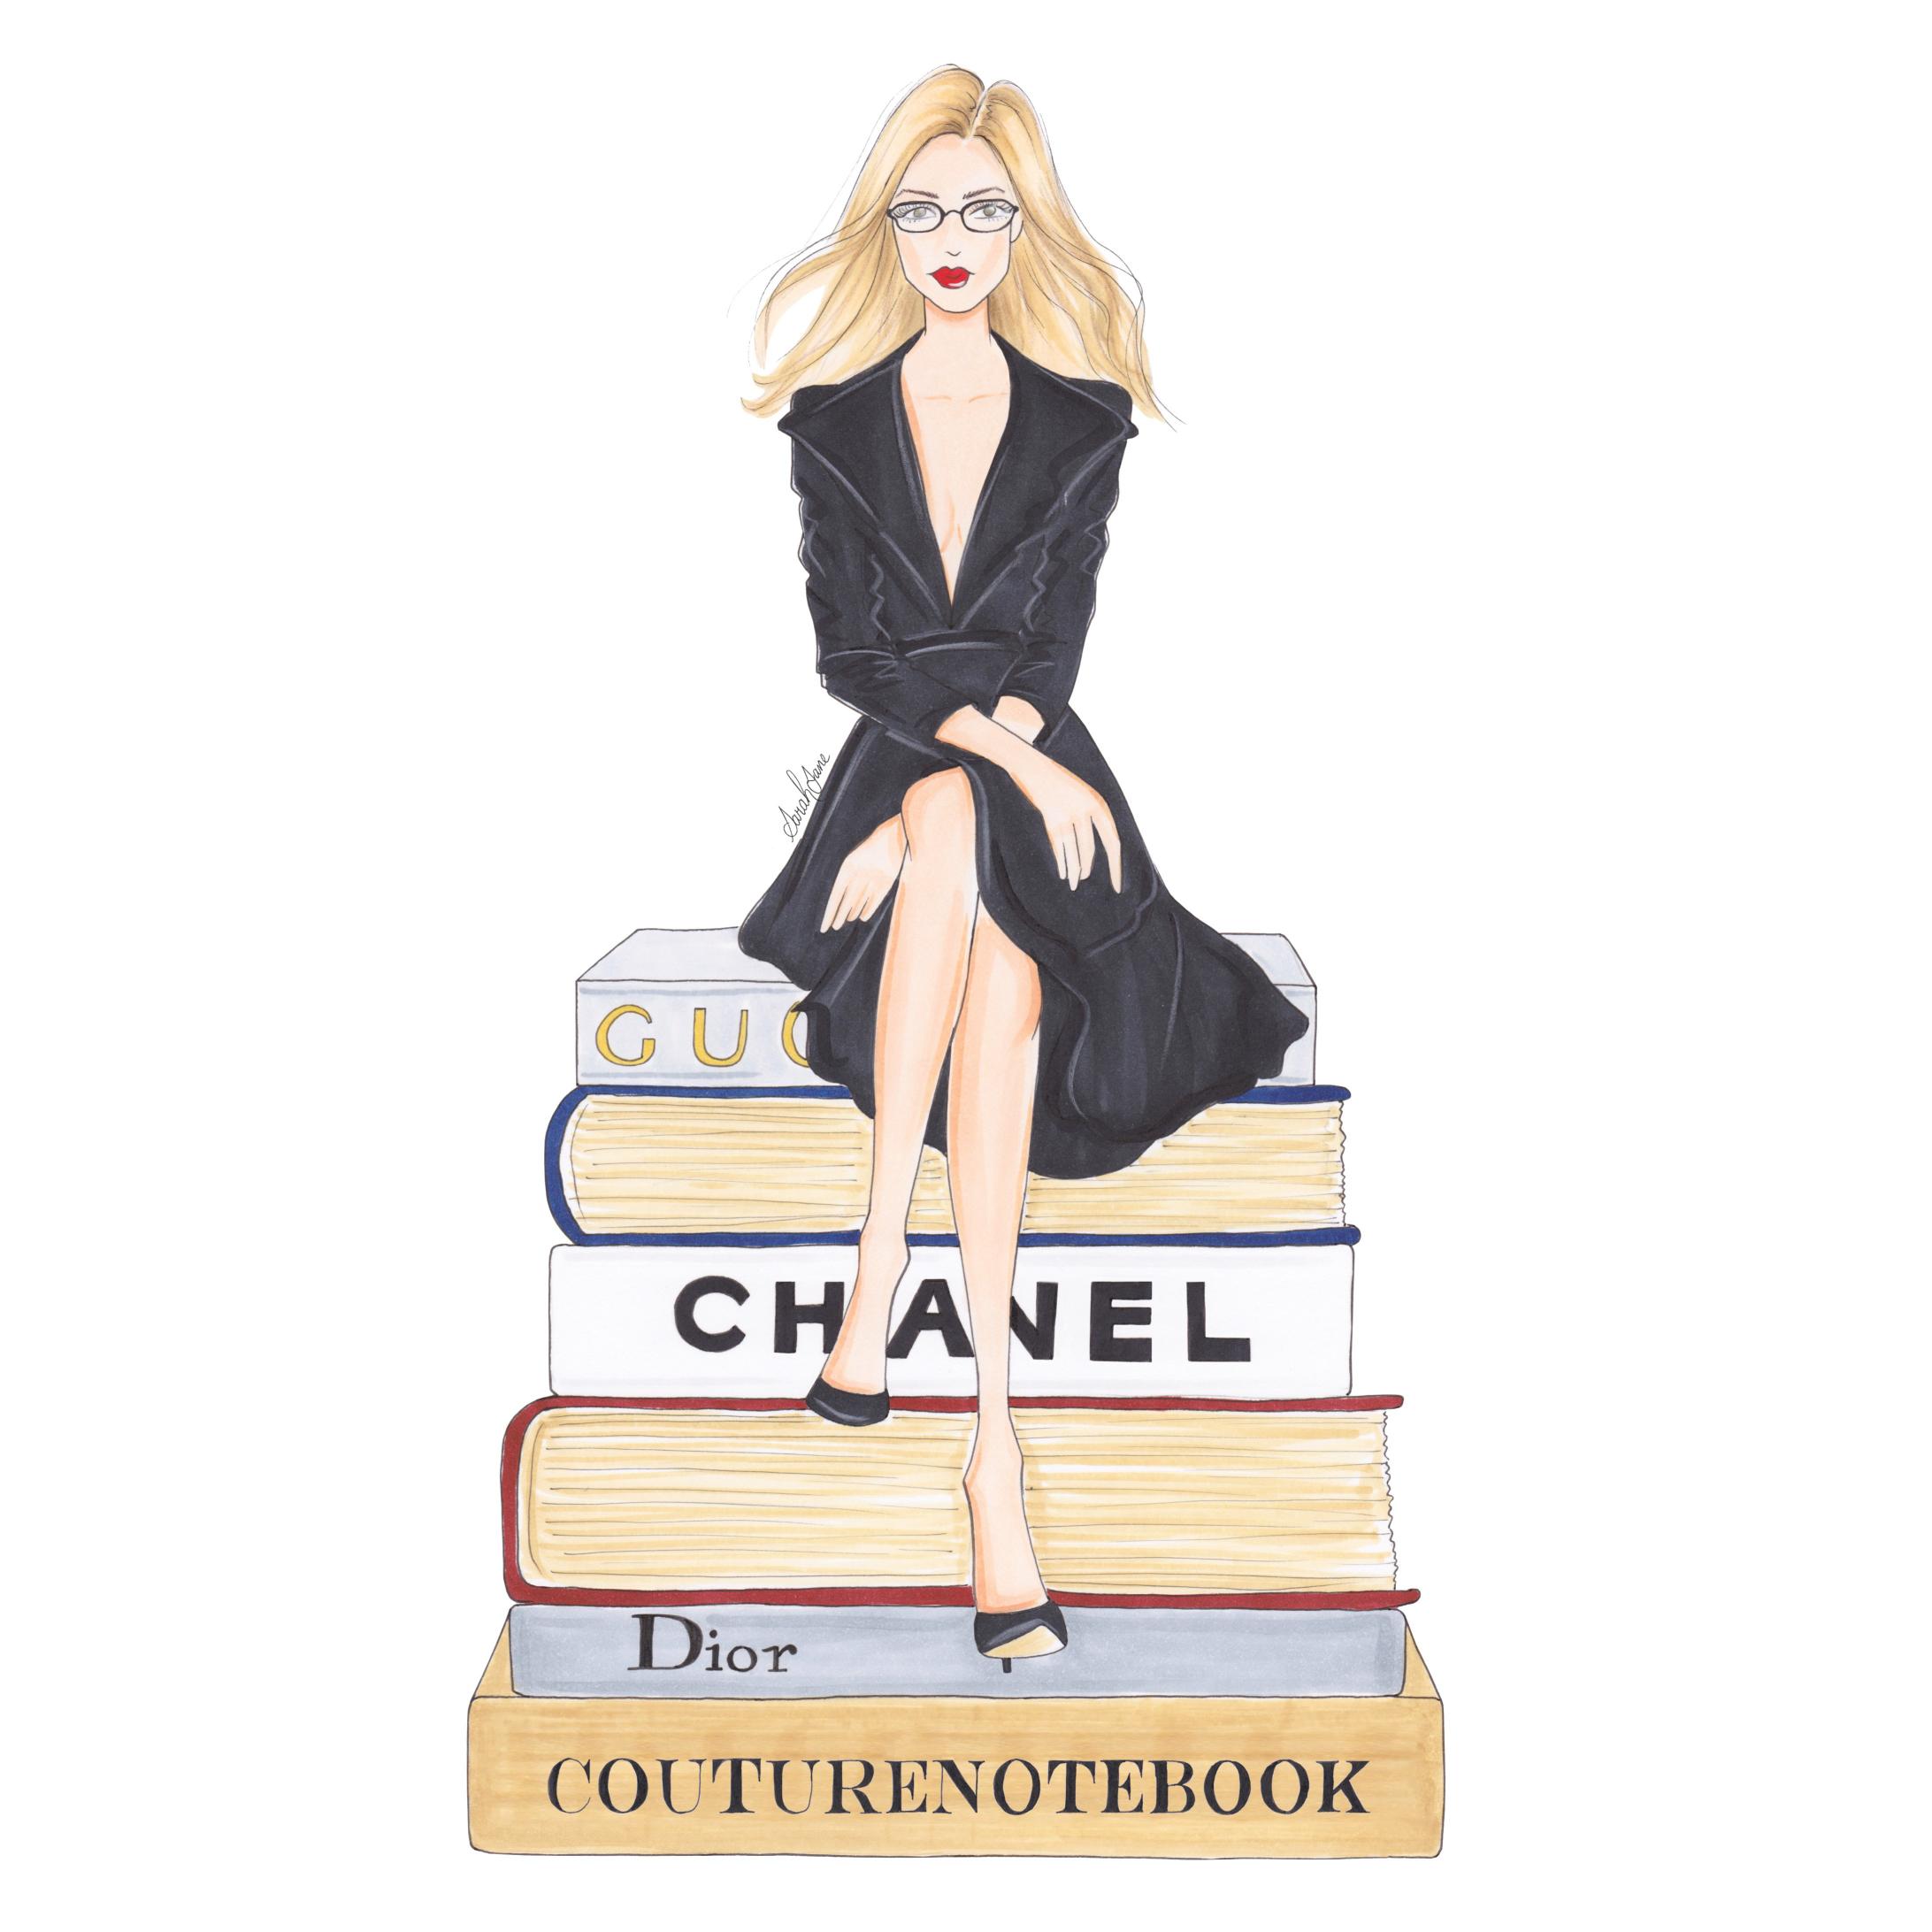 Couturenotebook illustration by @ IllustriousJane